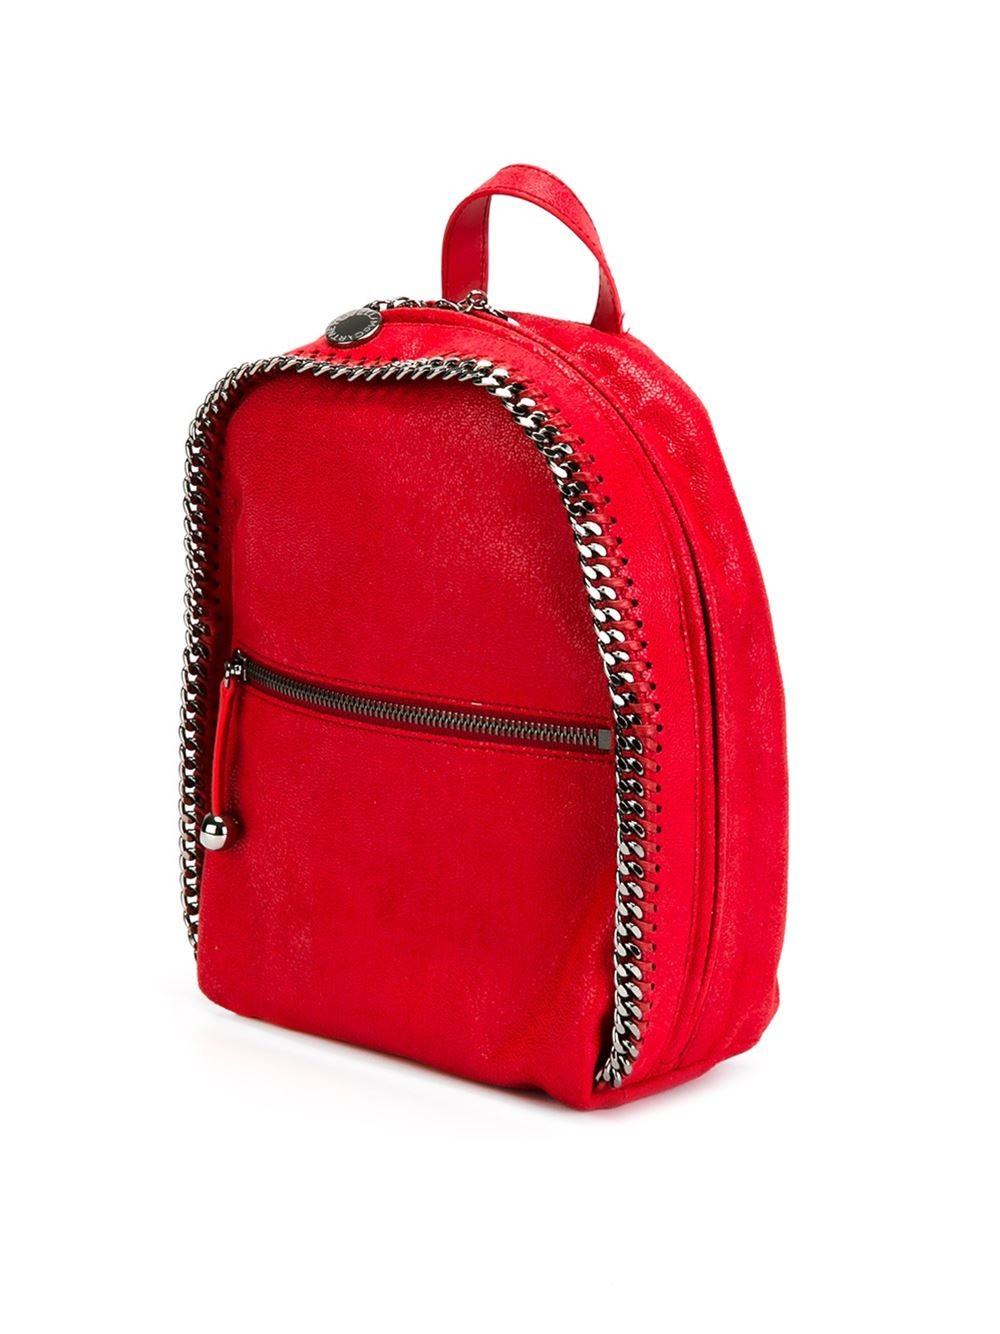 stella mccartney 39 falabella 39 backpack in red lyst. Black Bedroom Furniture Sets. Home Design Ideas